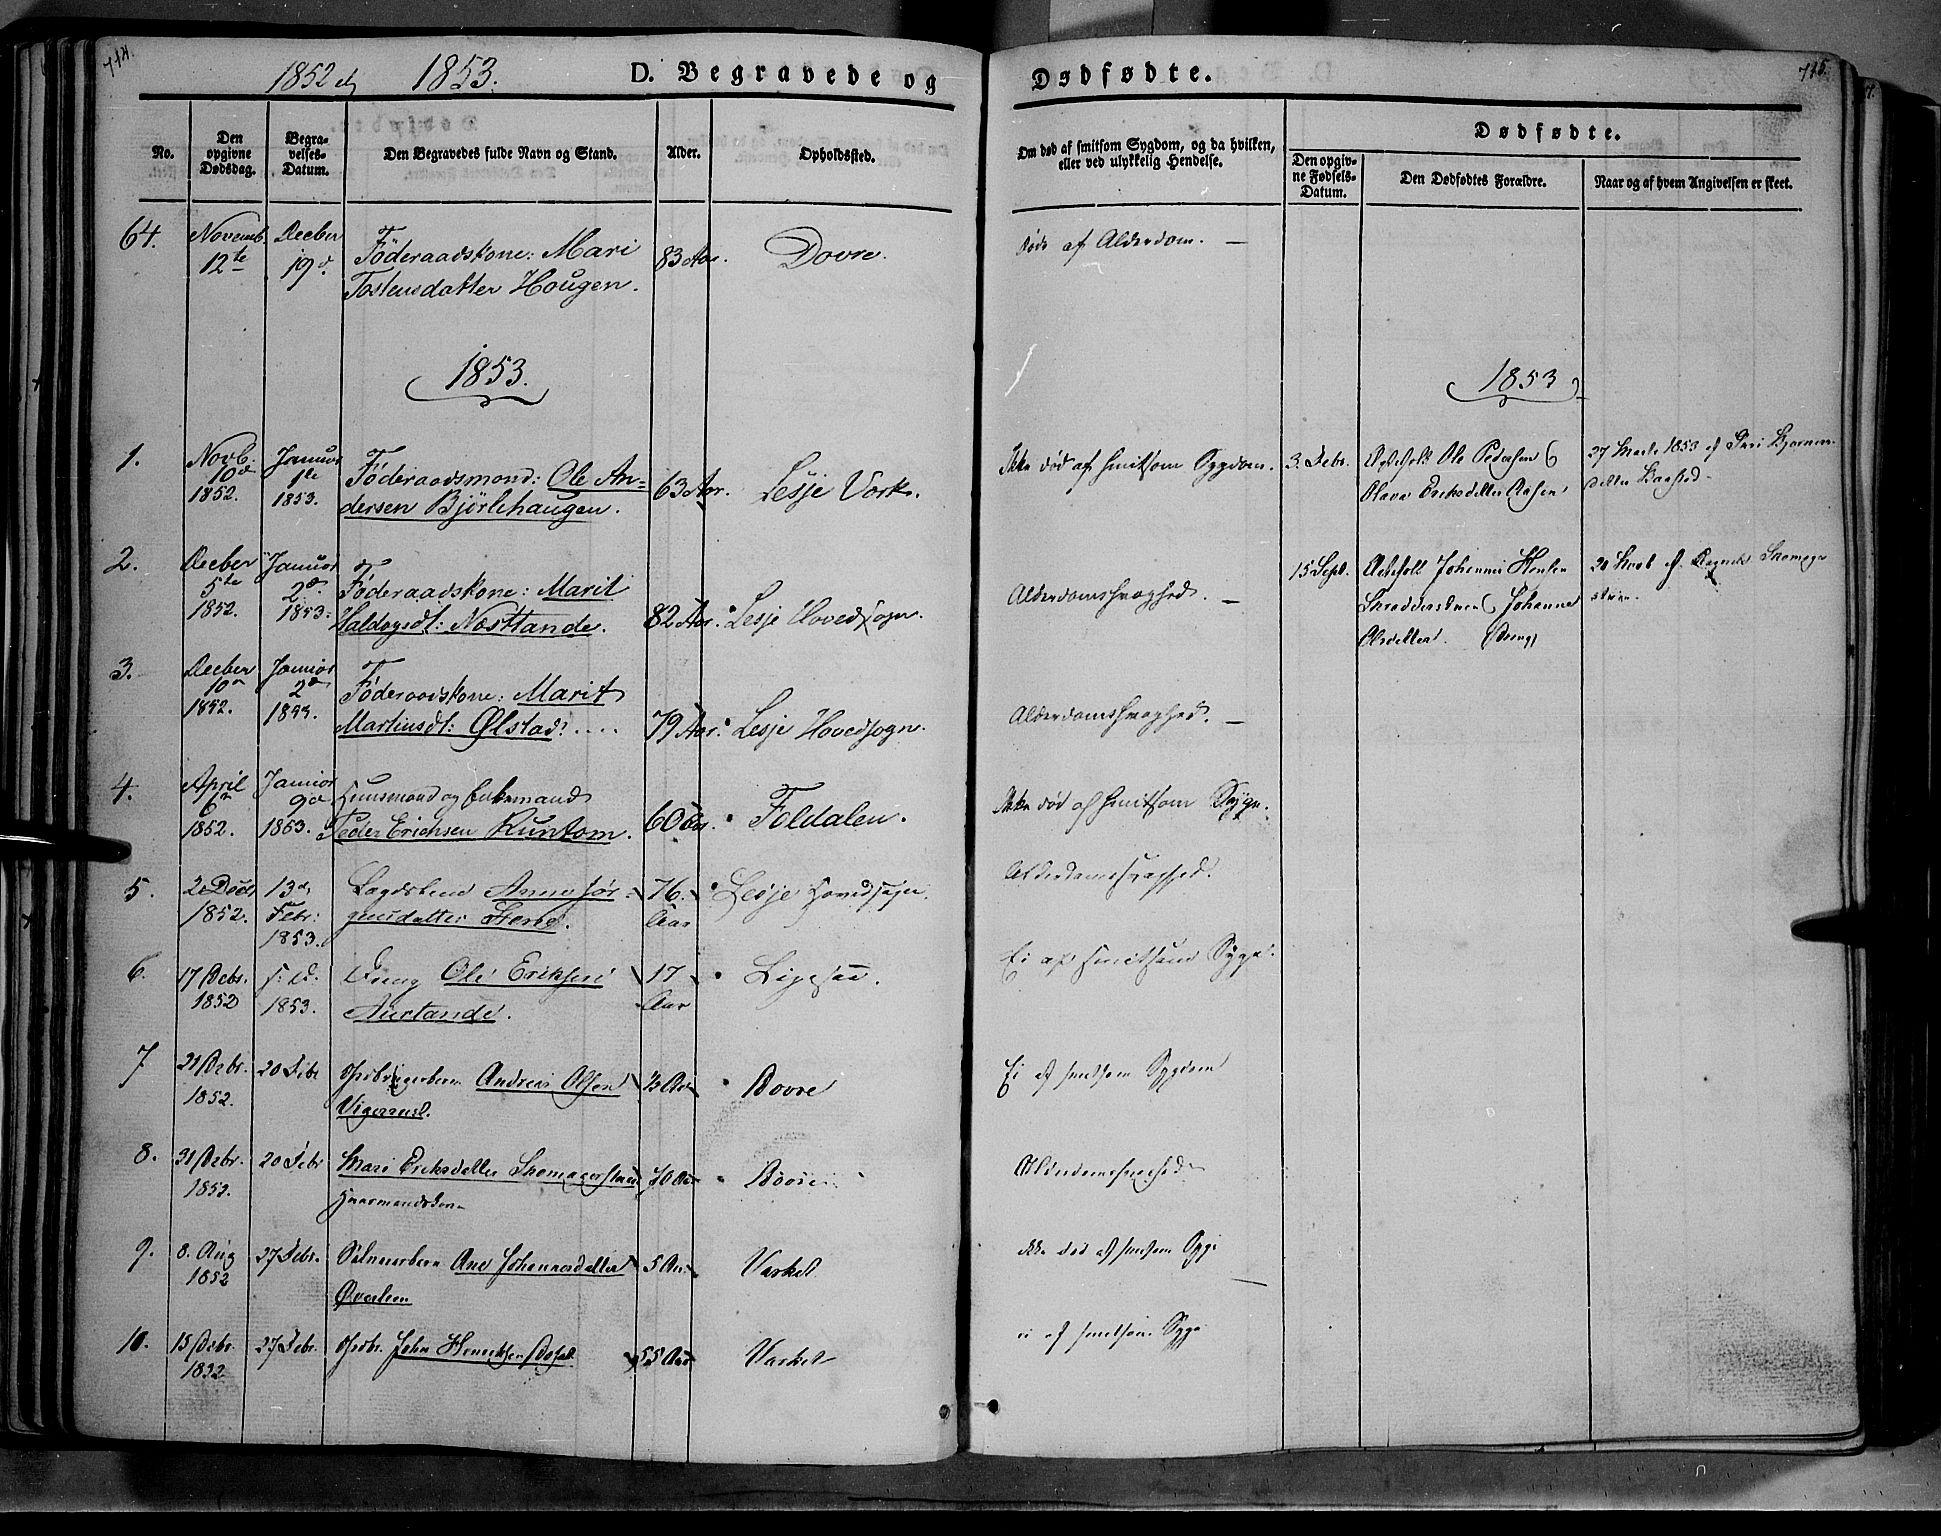 SAH, Lesja prestekontor, Ministerialbok nr. 6B, 1843-1854, s. 714-715